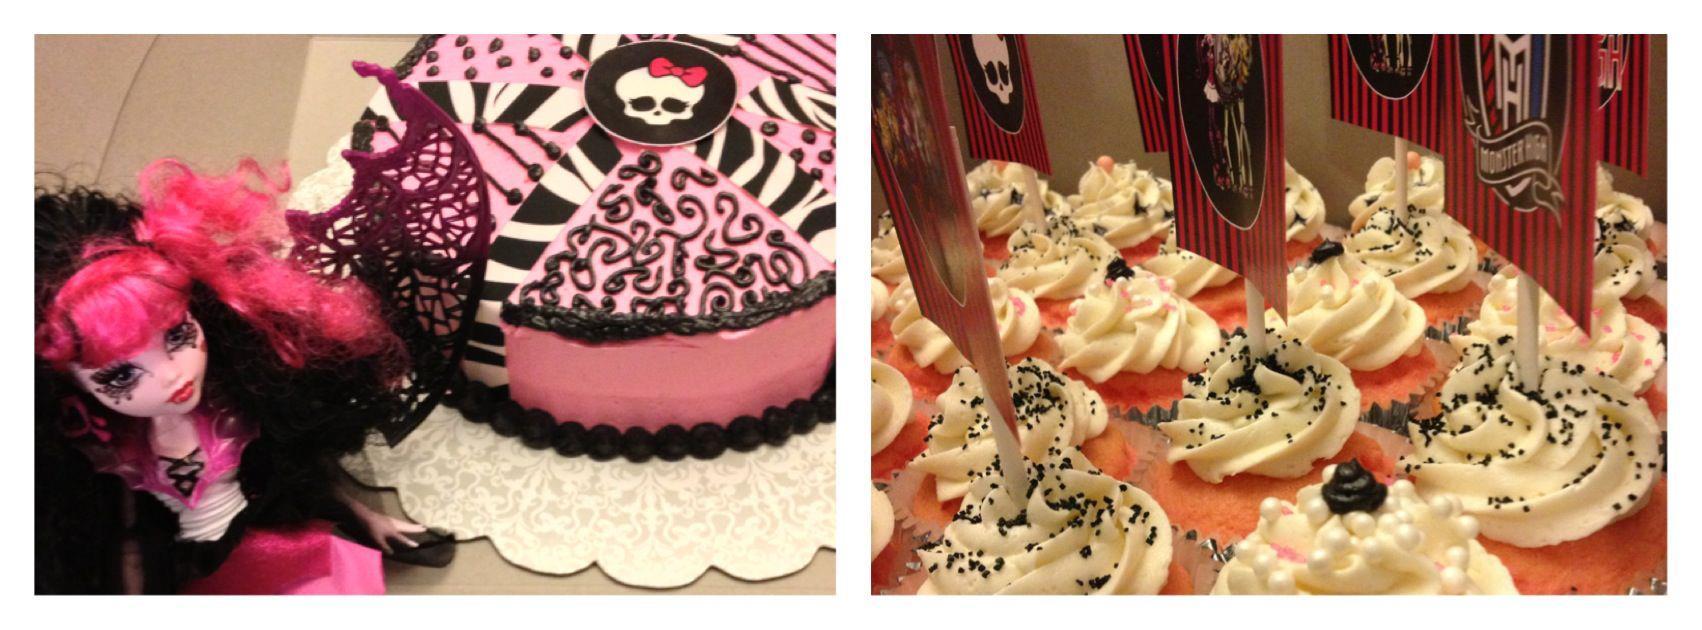 Monster High Birthday Smash Cake and Cupcakes with picks